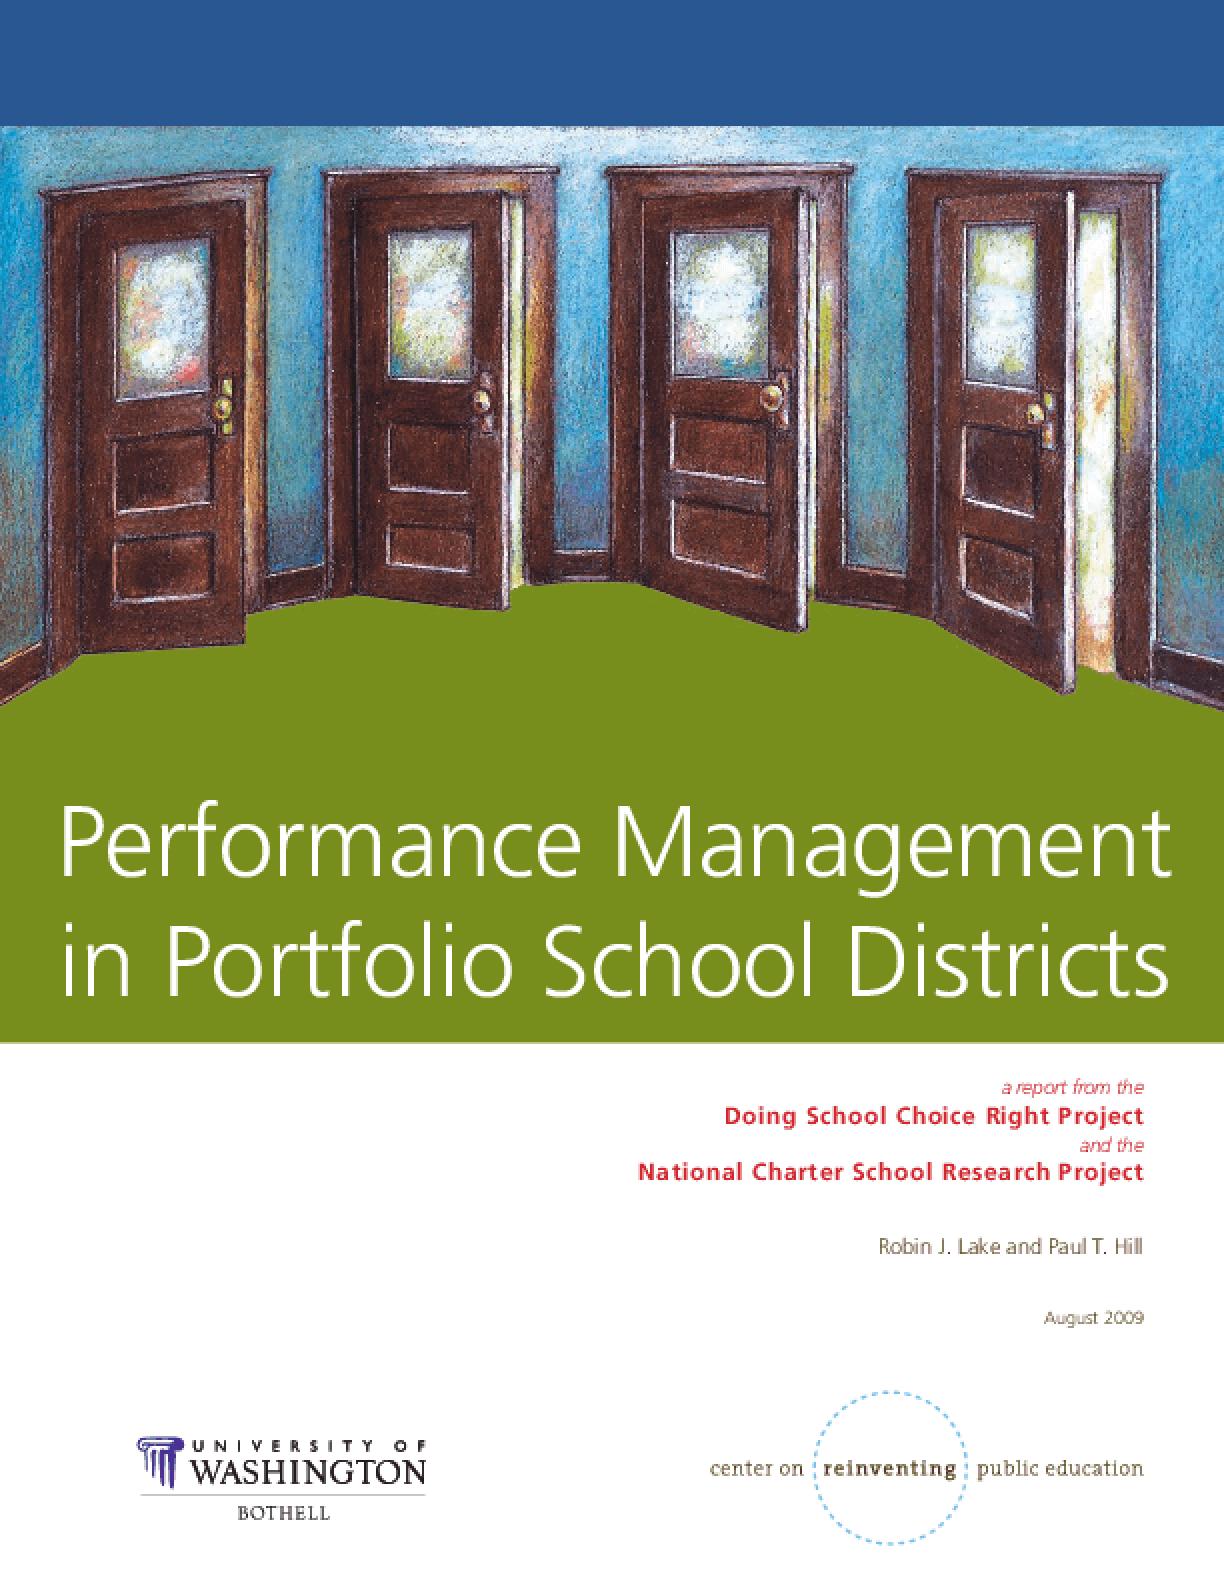 Performance Management in Portfolio School Districts